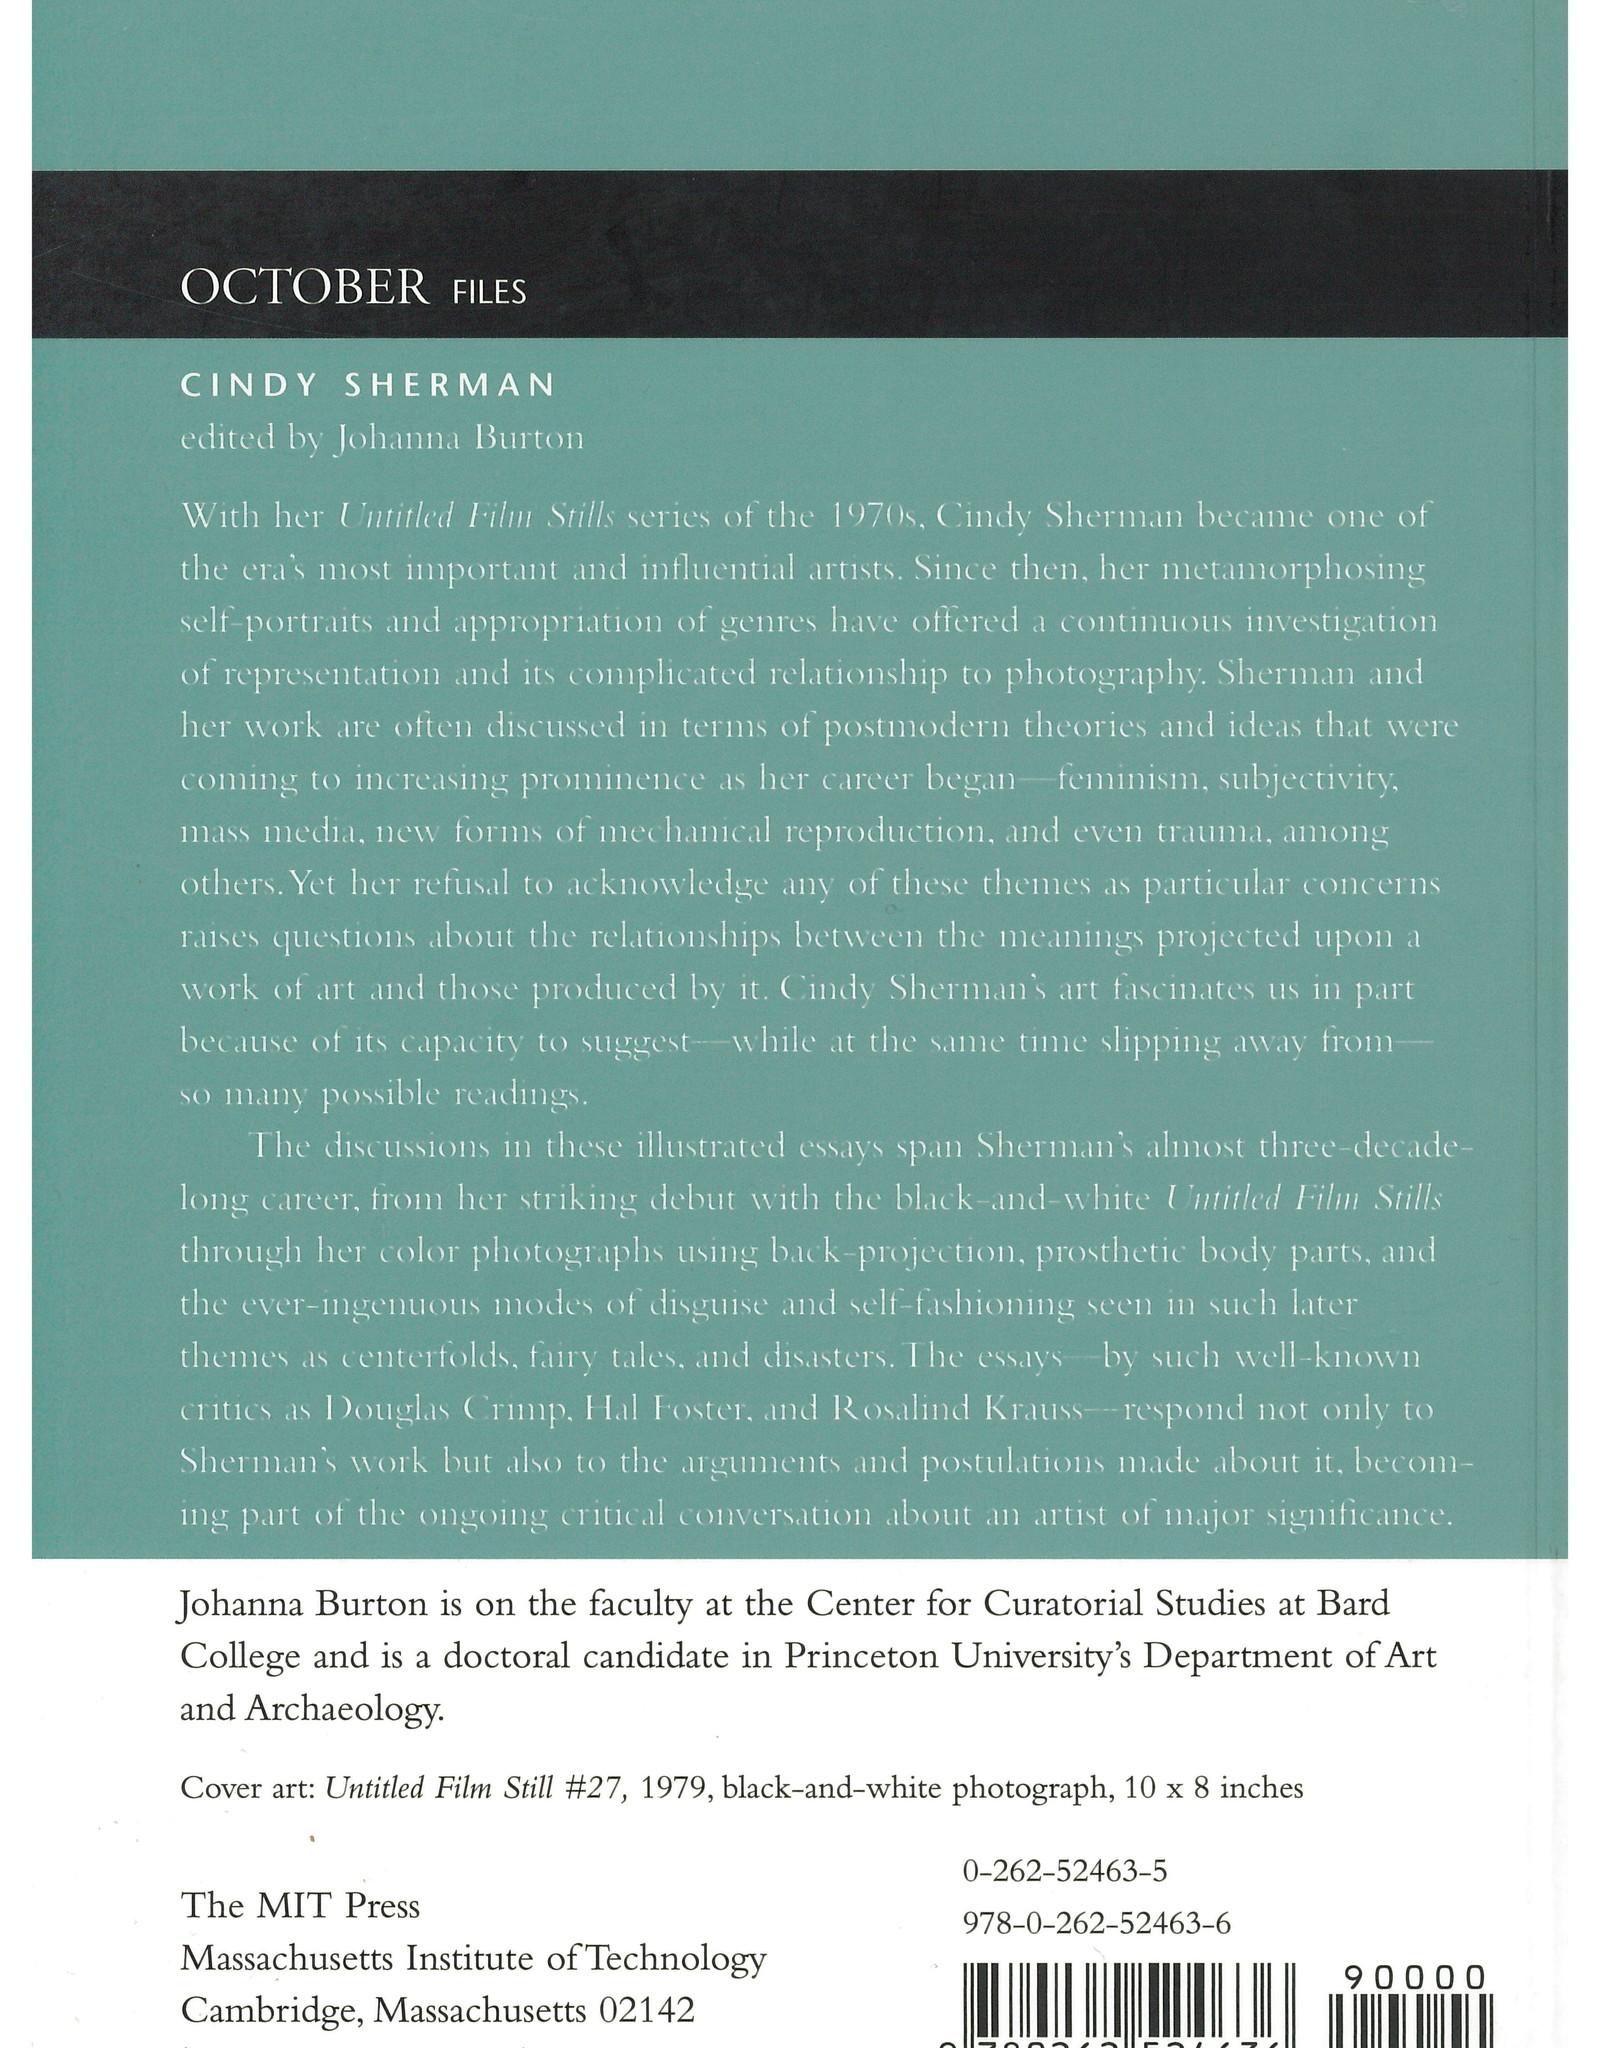 October Files - Cindy Sherman  / Johanna Burton